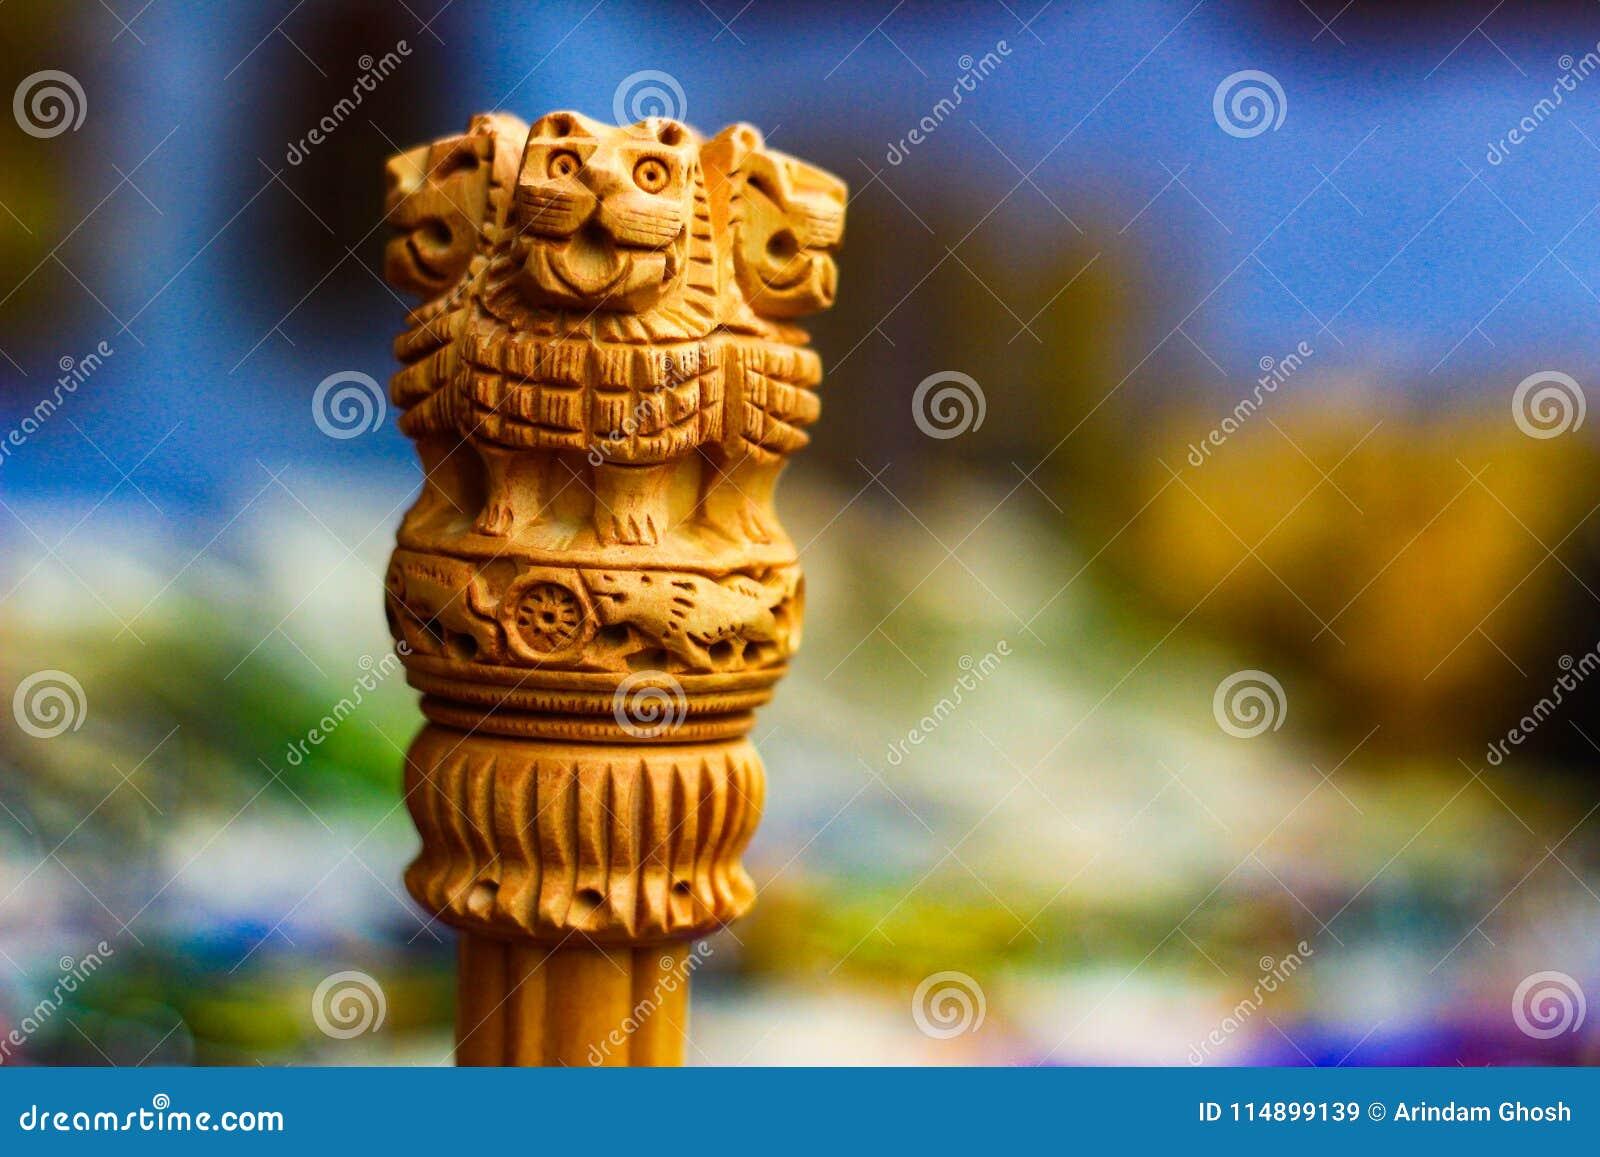 Ashoka Stambha微型木复制品  一座古老历史的印地安纪念碑 Ashoka,印地安国徽的狮子面孔Pliiar